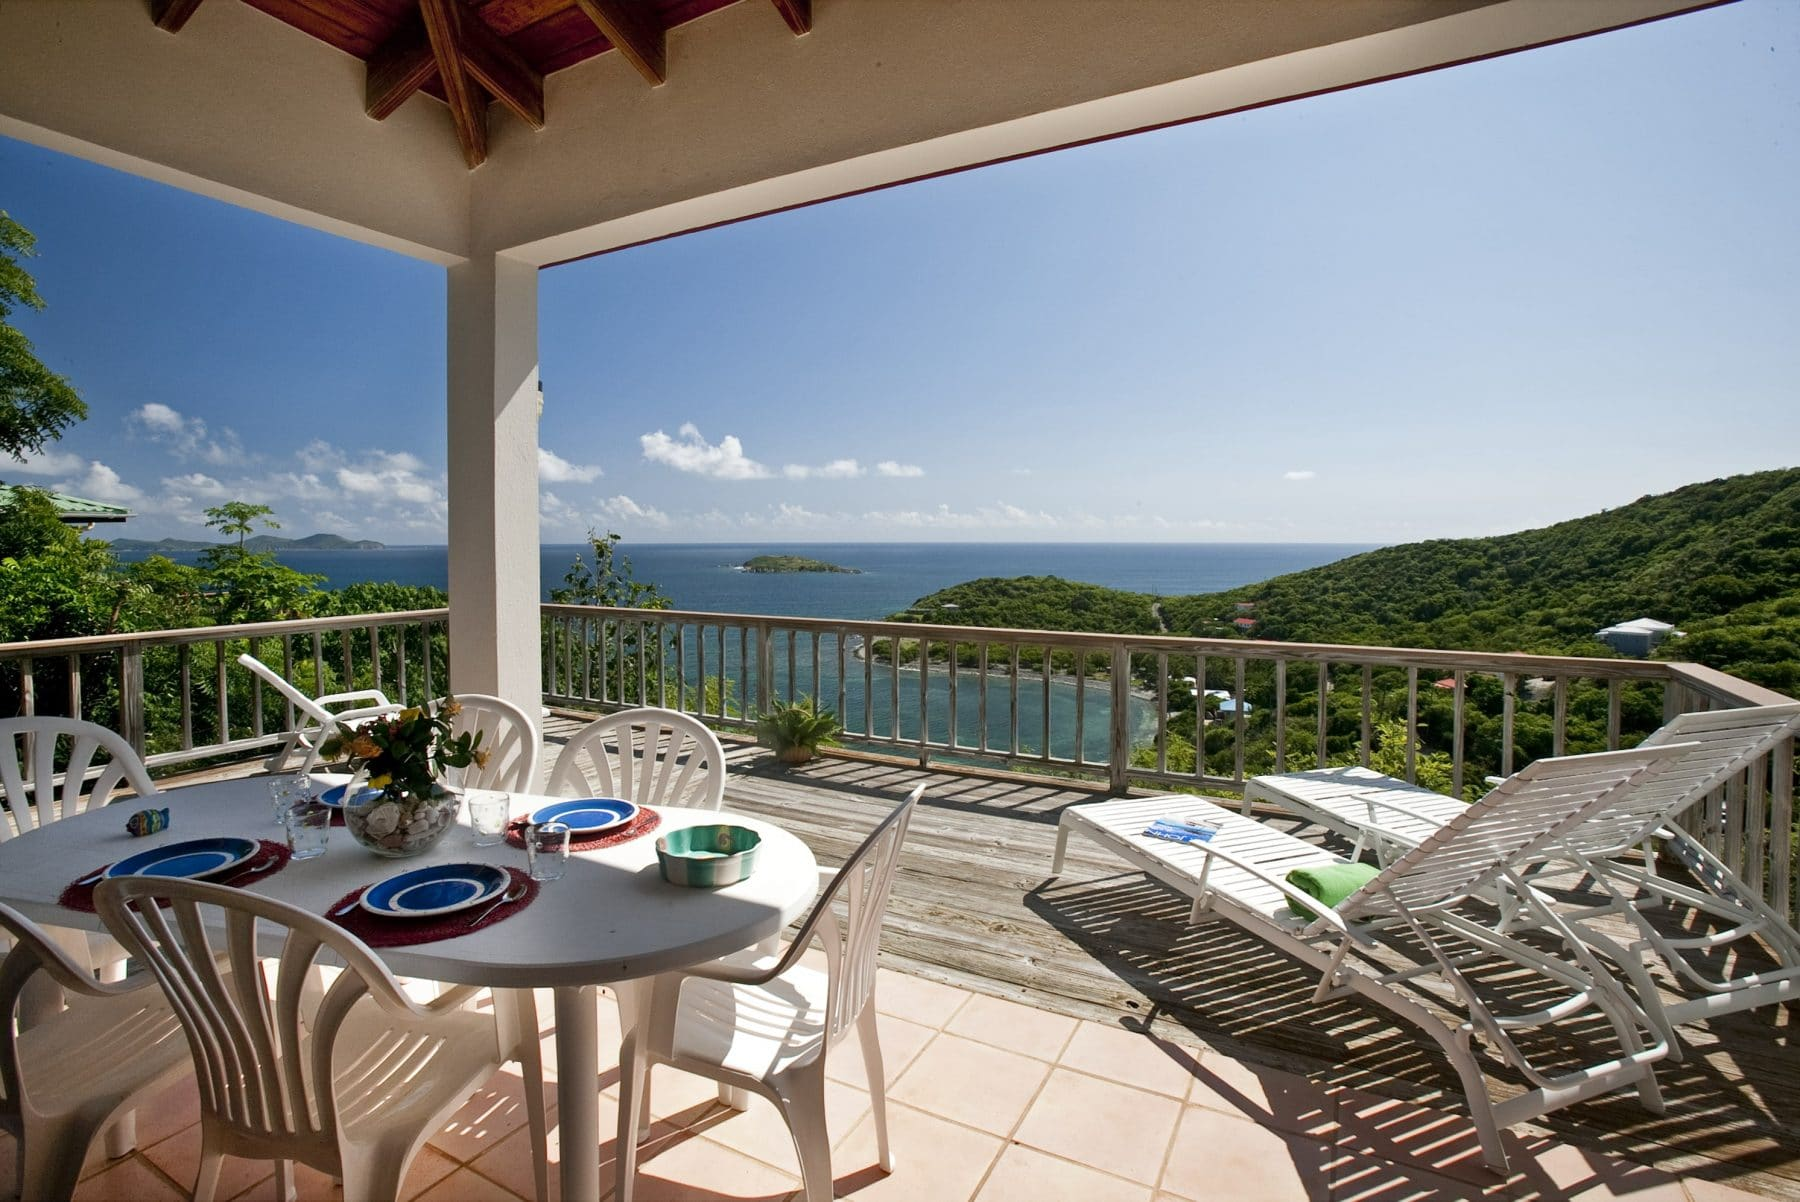 t john vacation rentals Casanita Porch